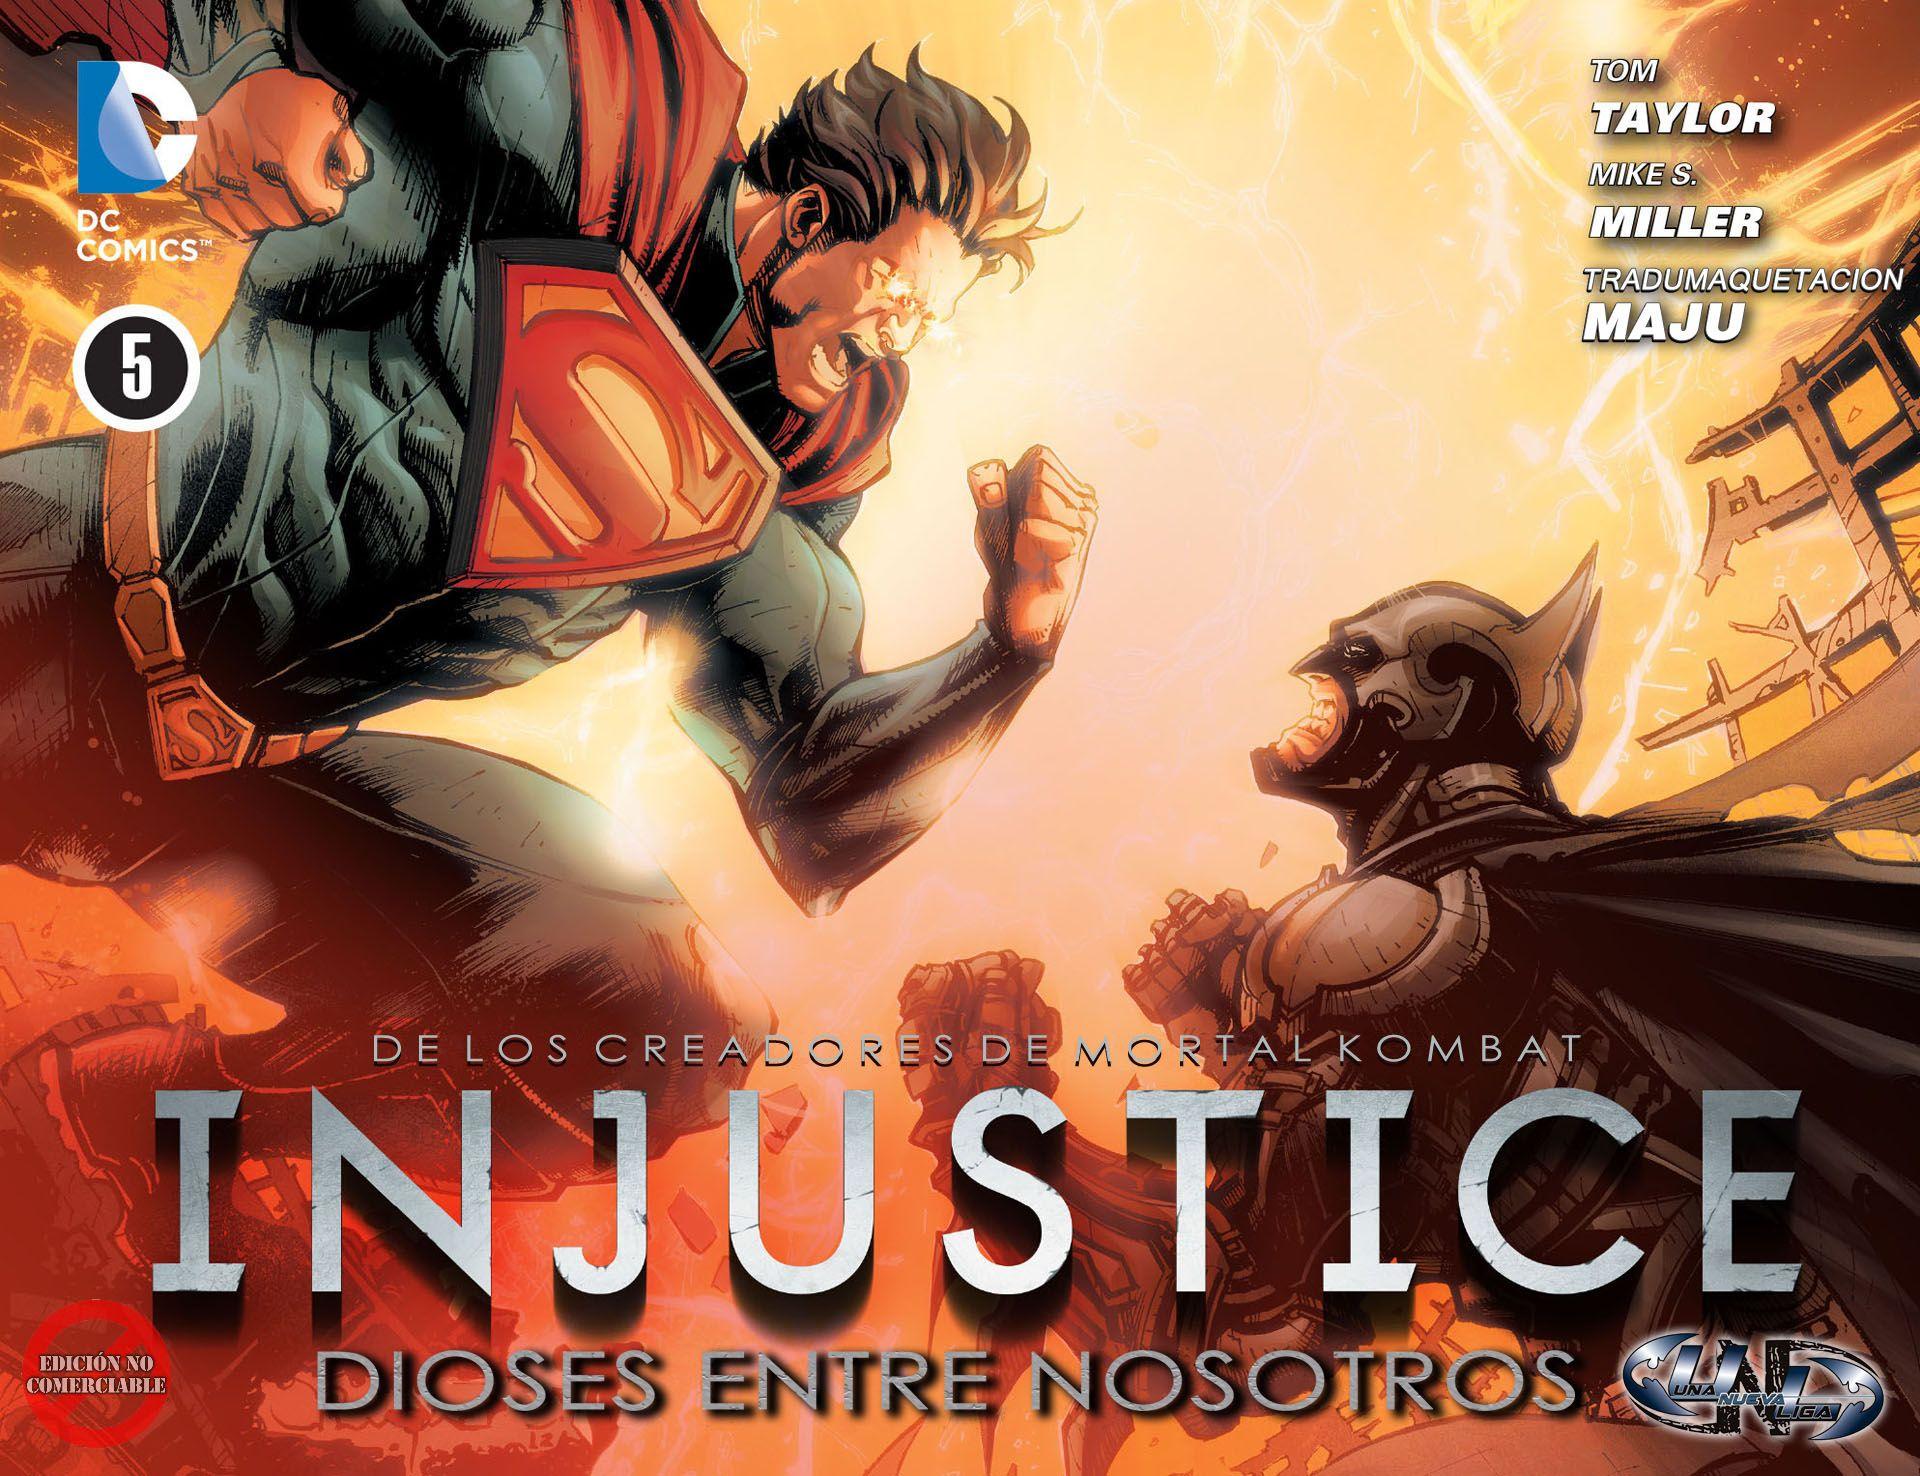 Superman vs Batman - Injustice - Gods among us